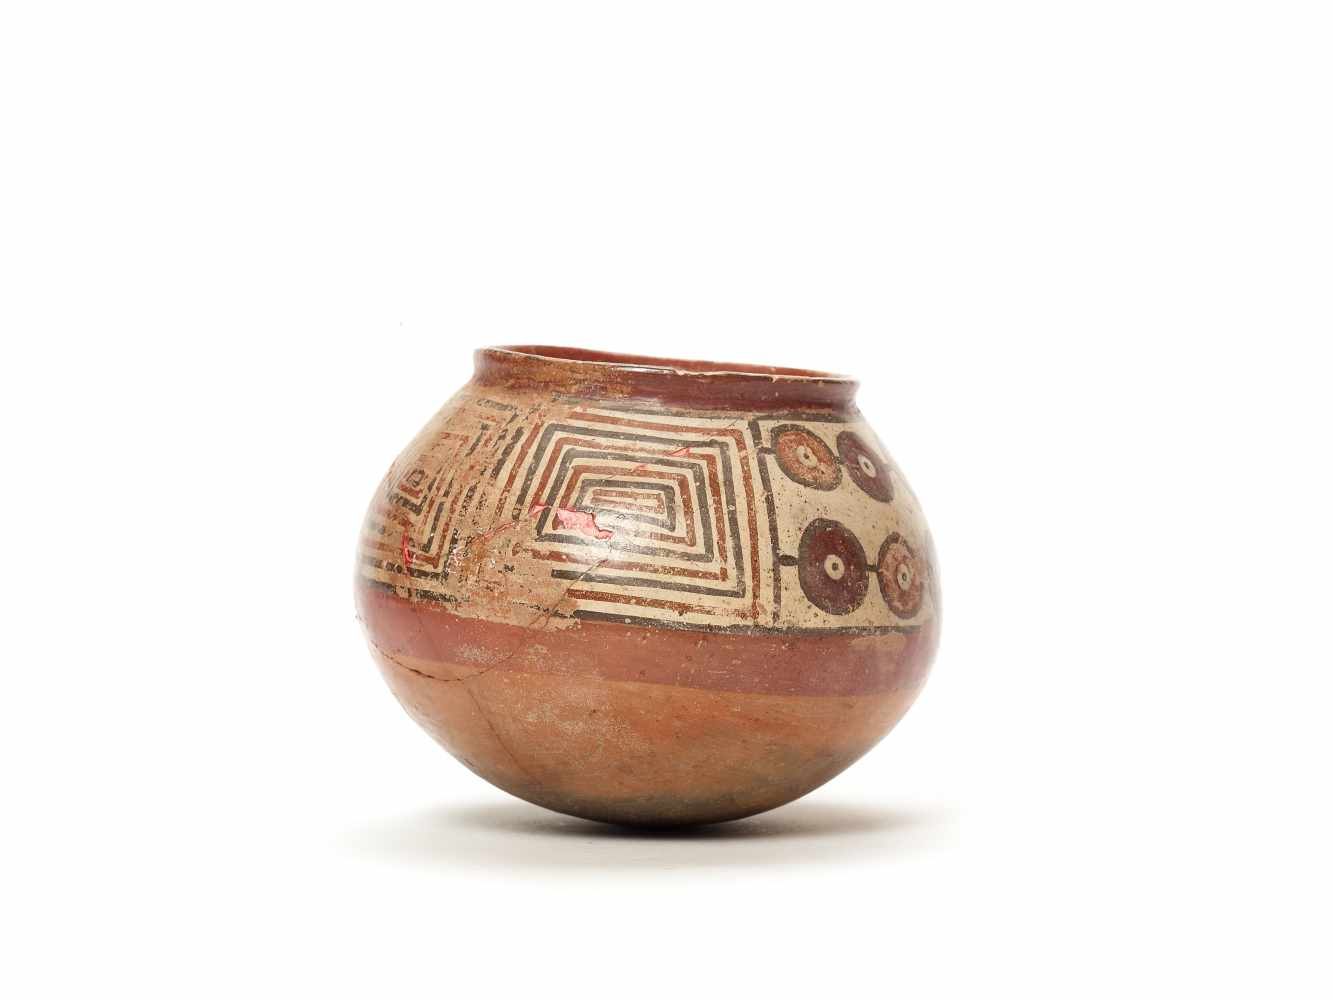 PAINTED CLAY POT - NAZCA, PERU, C. 300-600 ADPainted clayNazca, Peru, c. 300-600 ADSpherical form - Image 3 of 3